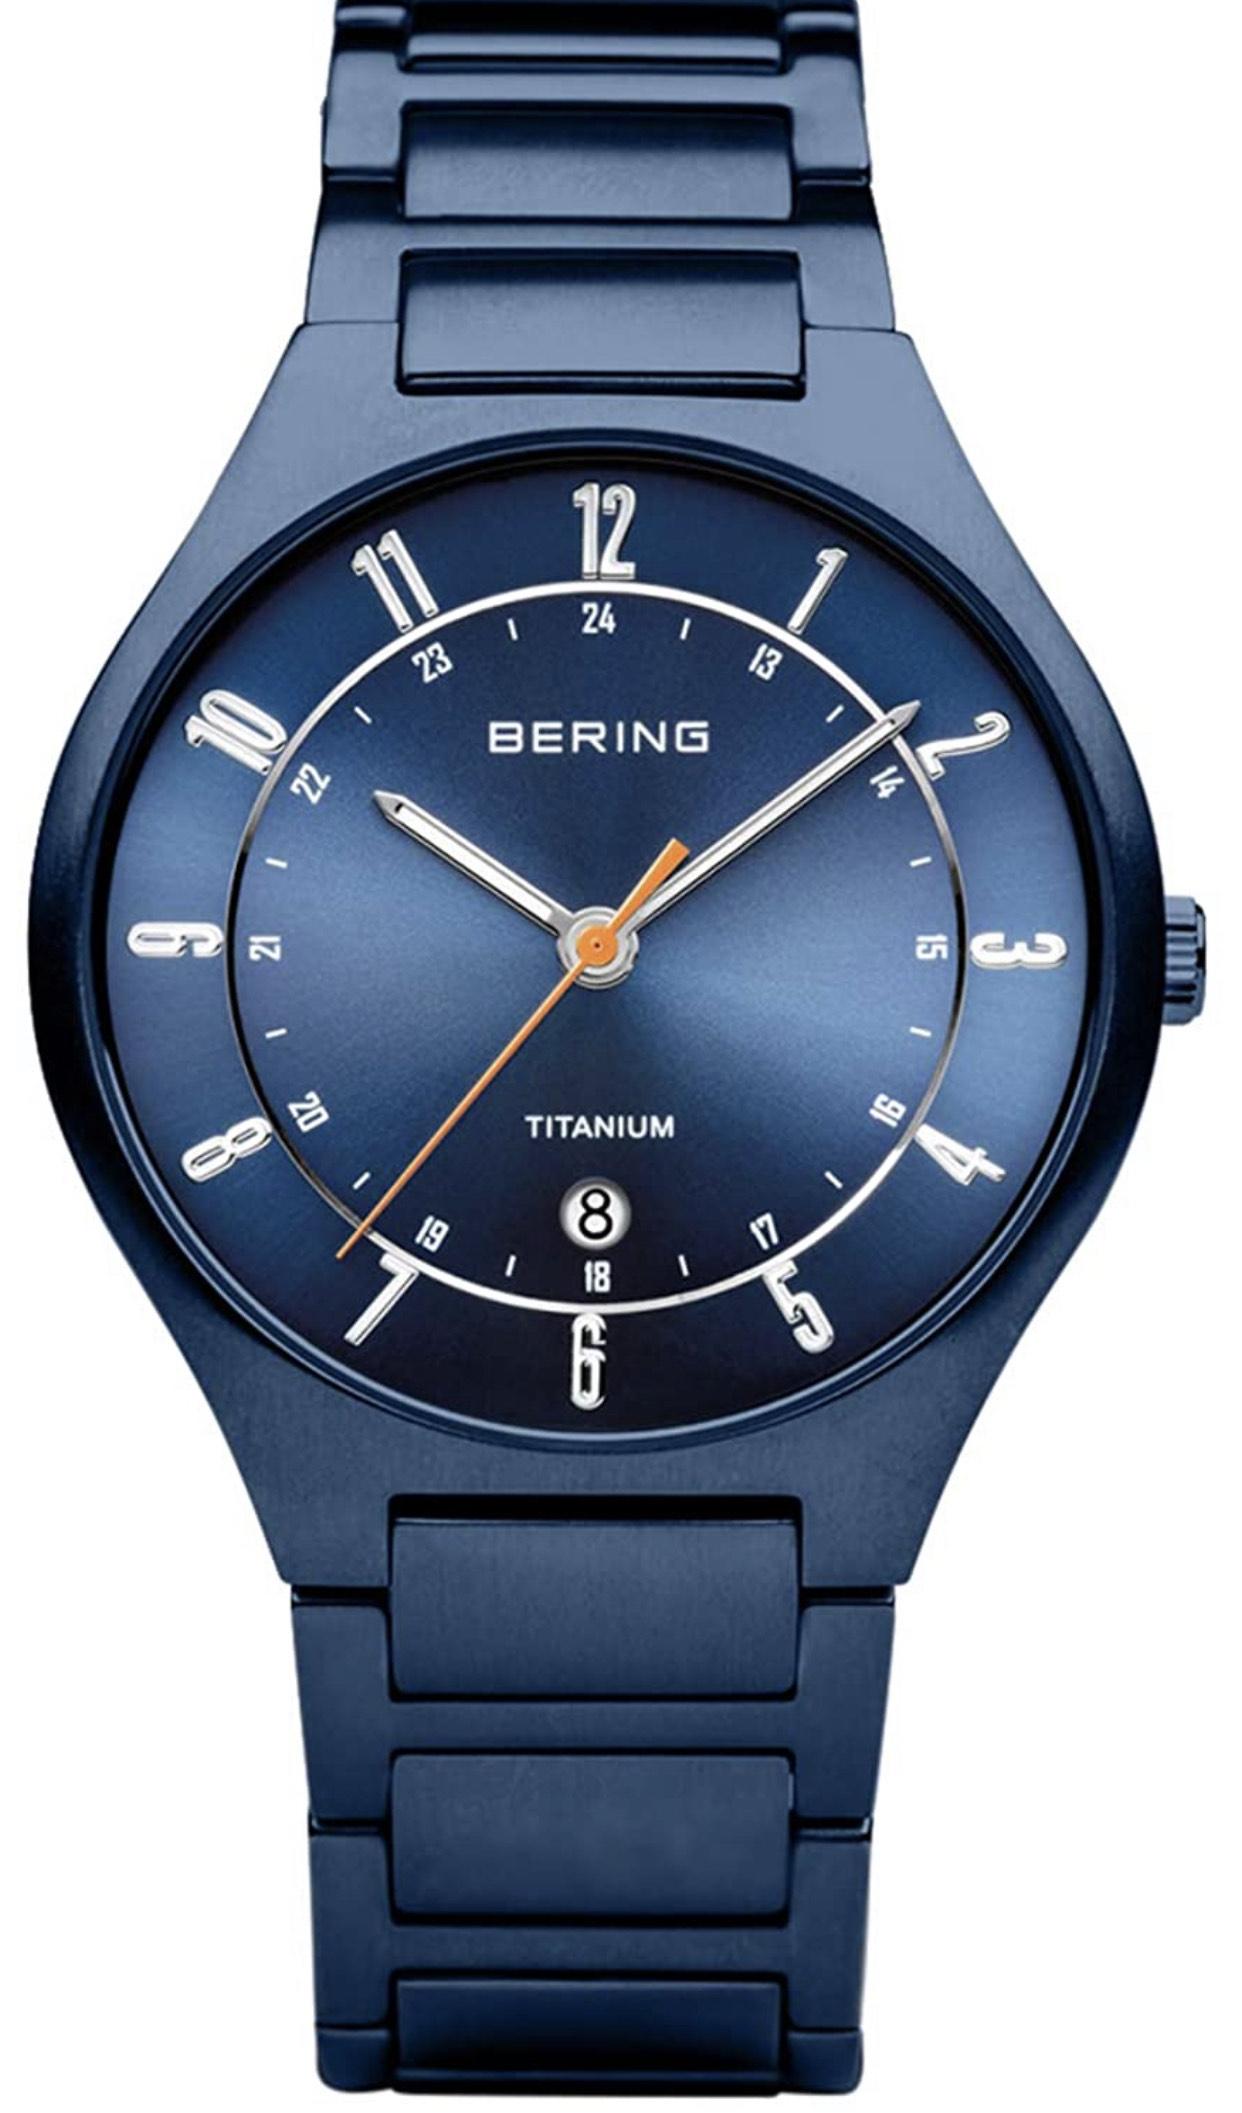 BERING Herren Analog Quarz Uhr 39mm mit Titan Armband 11739-797 Saphirglas 5ATM